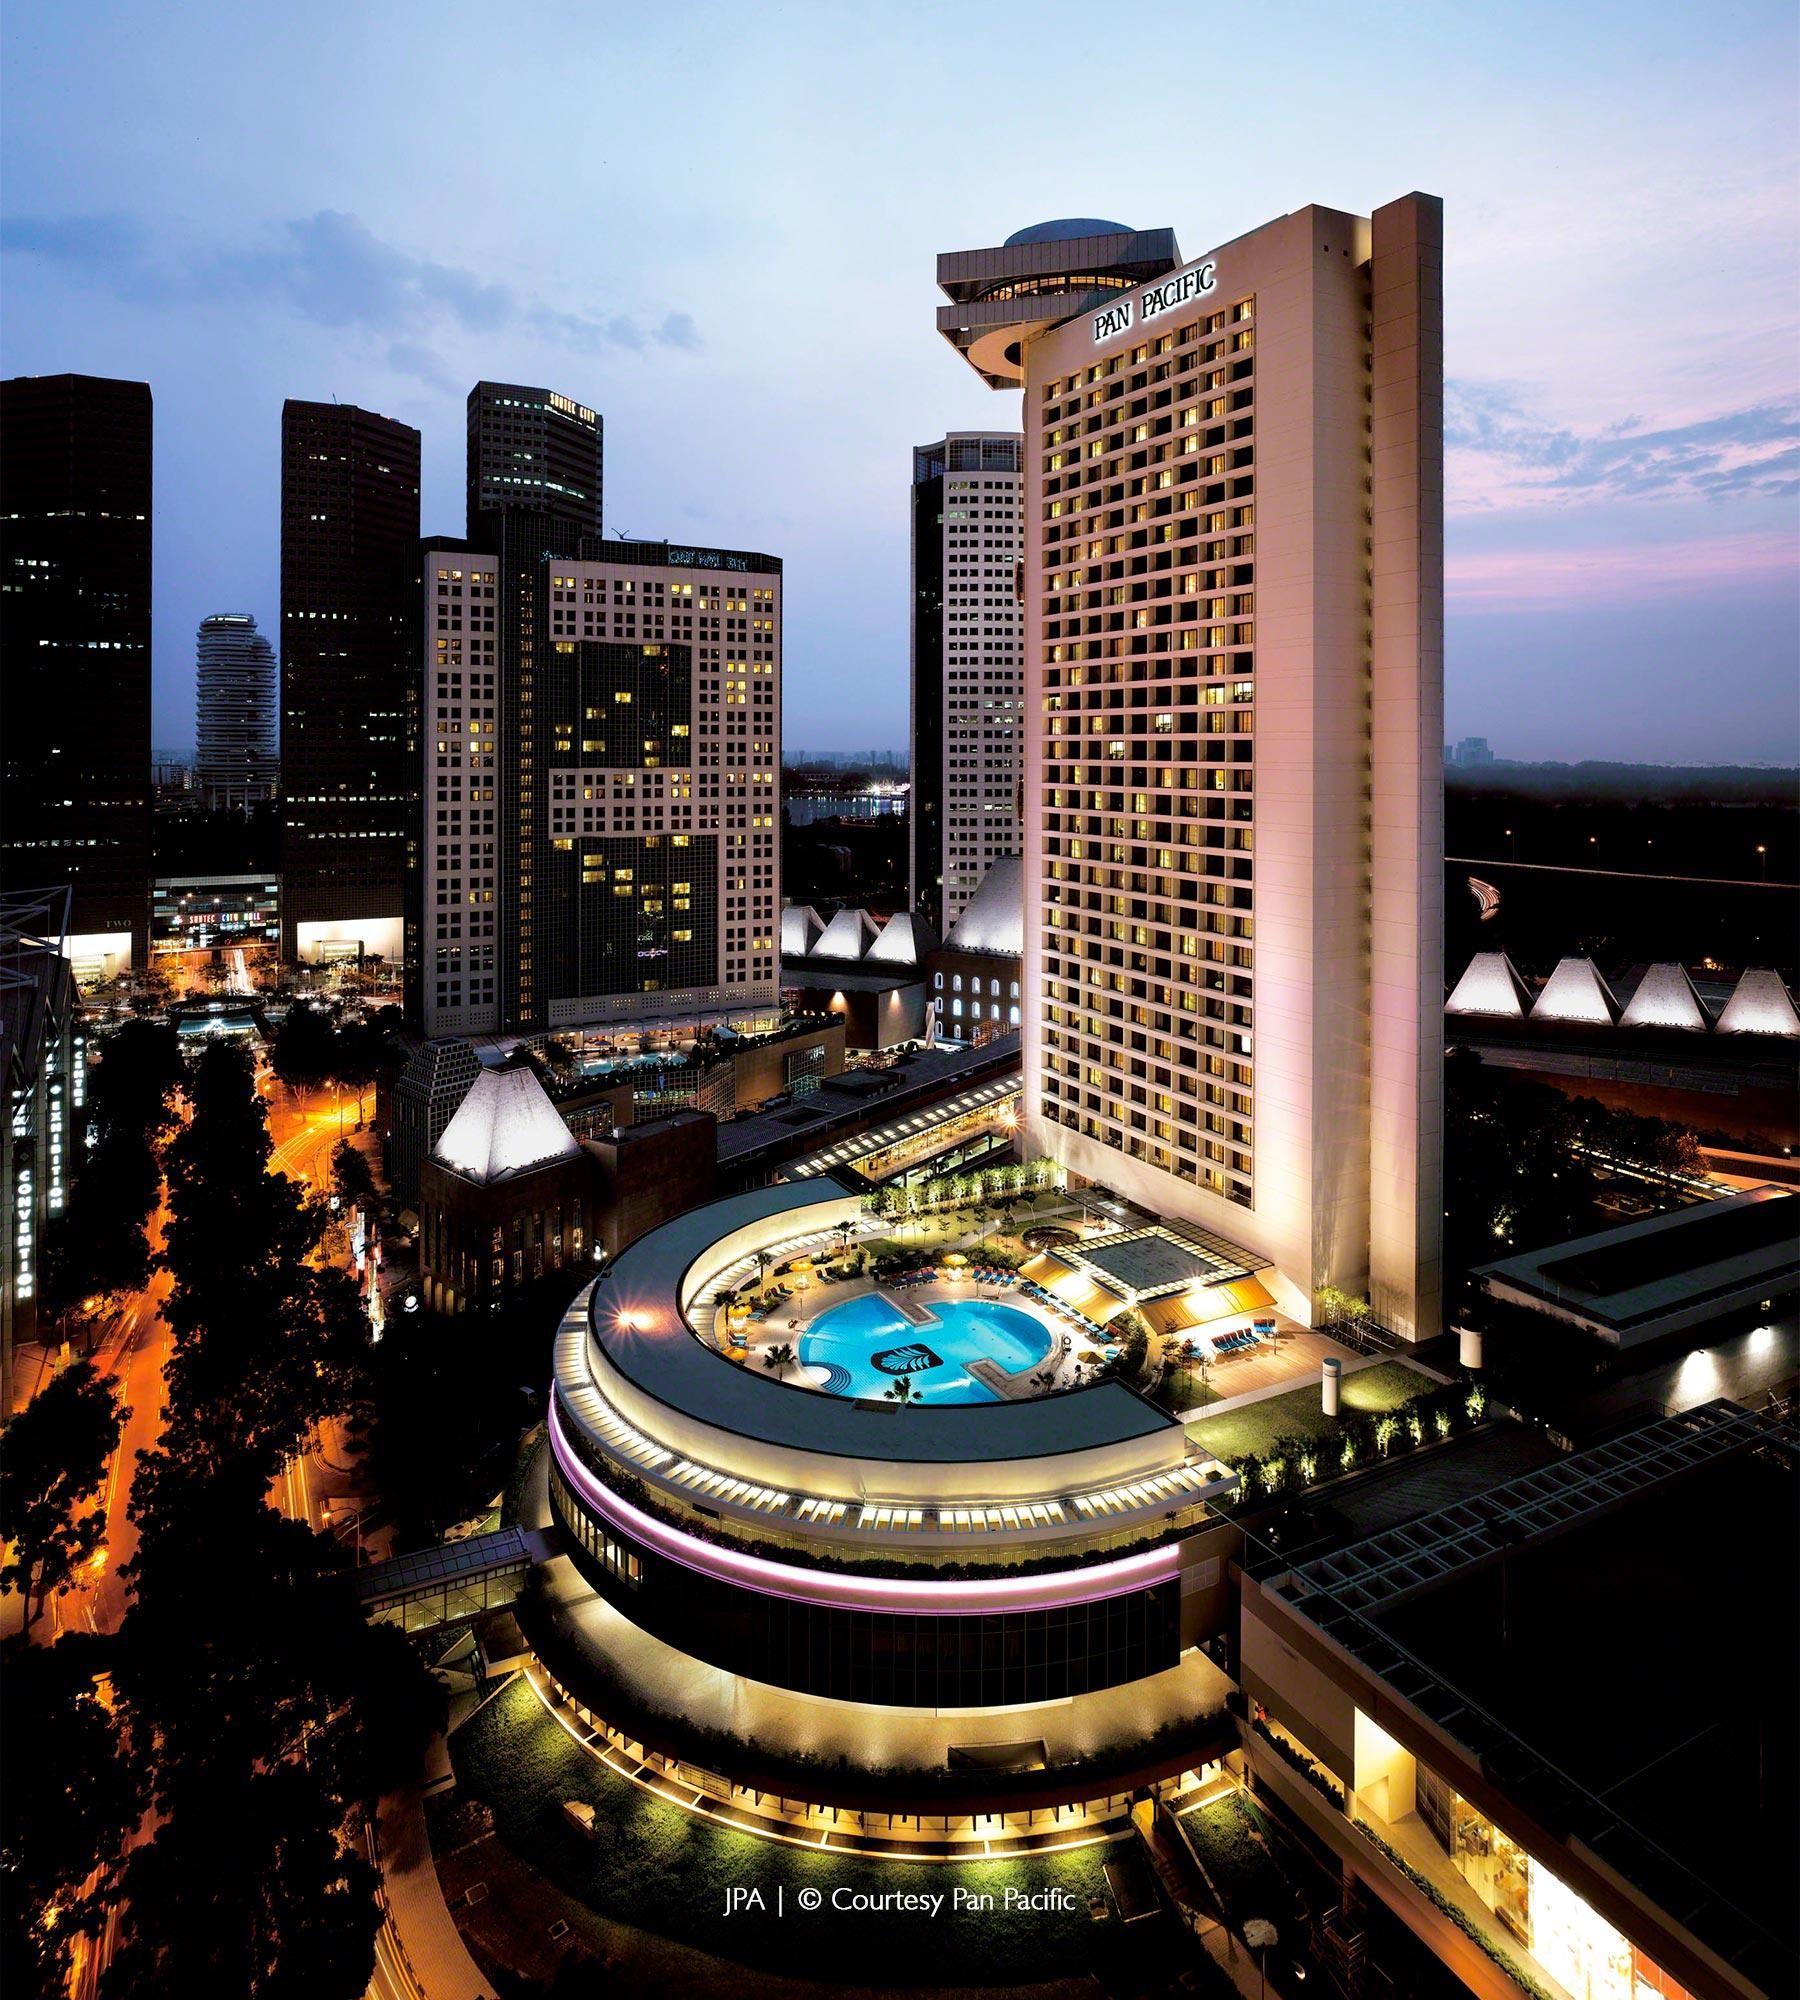 John Portman Associates Projects Singapore Hospitality Pan Pacific Hotel Project Gallery Singapore Hotels Pacific Hotel Beautiful Places To Visit